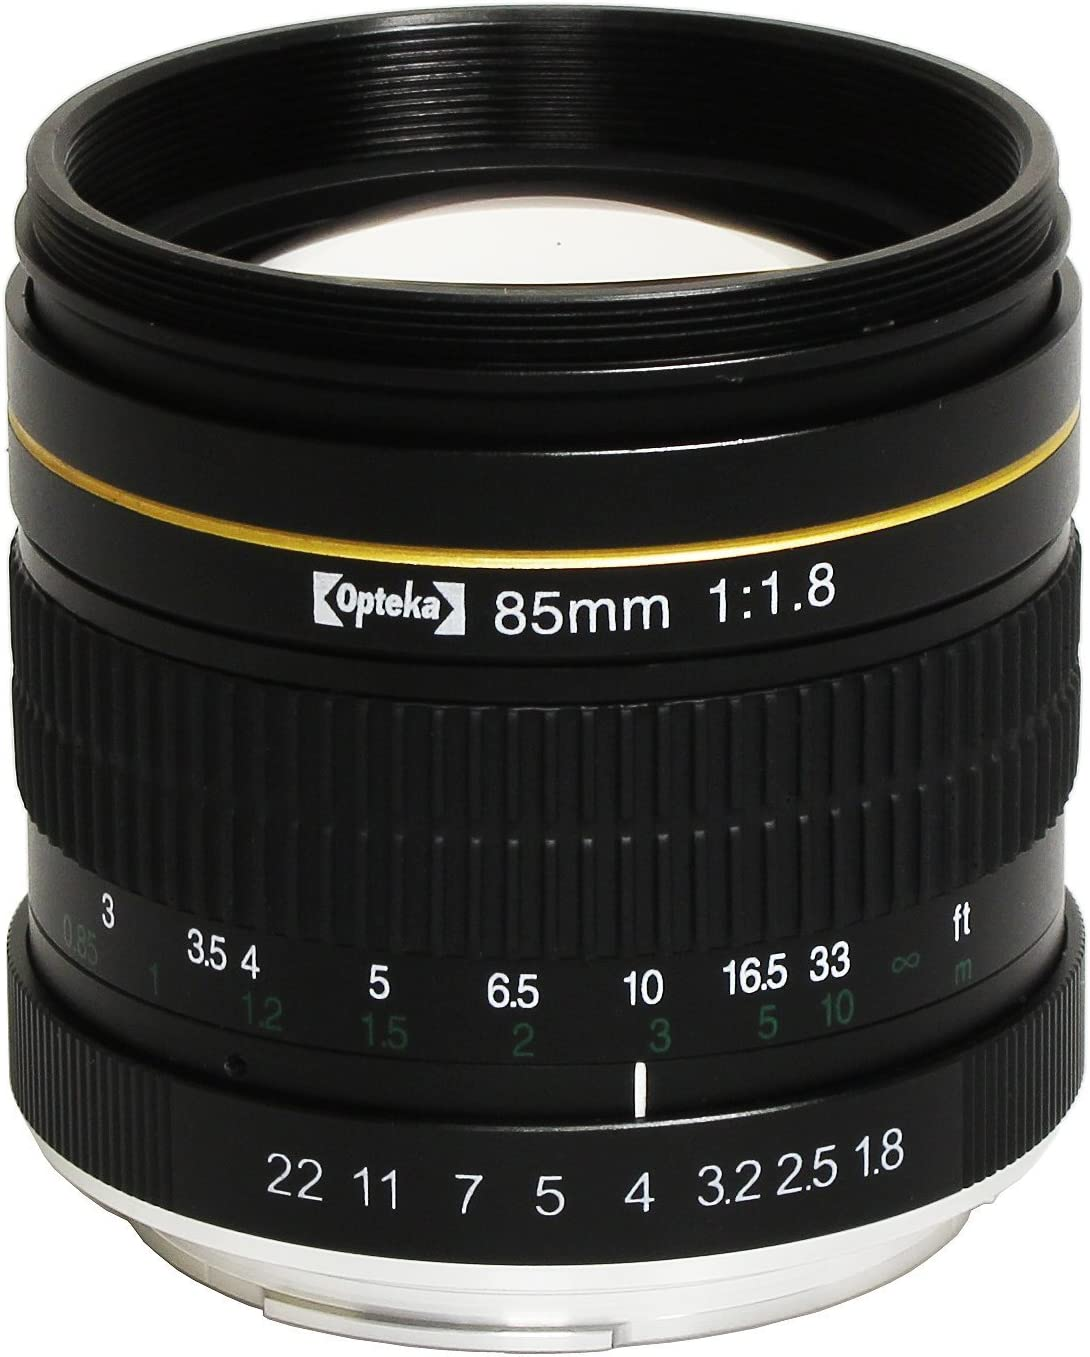 T6s T6i 50D T7i T5i T7s 60Da 7D Opteka 85mm f/1.8 Manual Focus ...